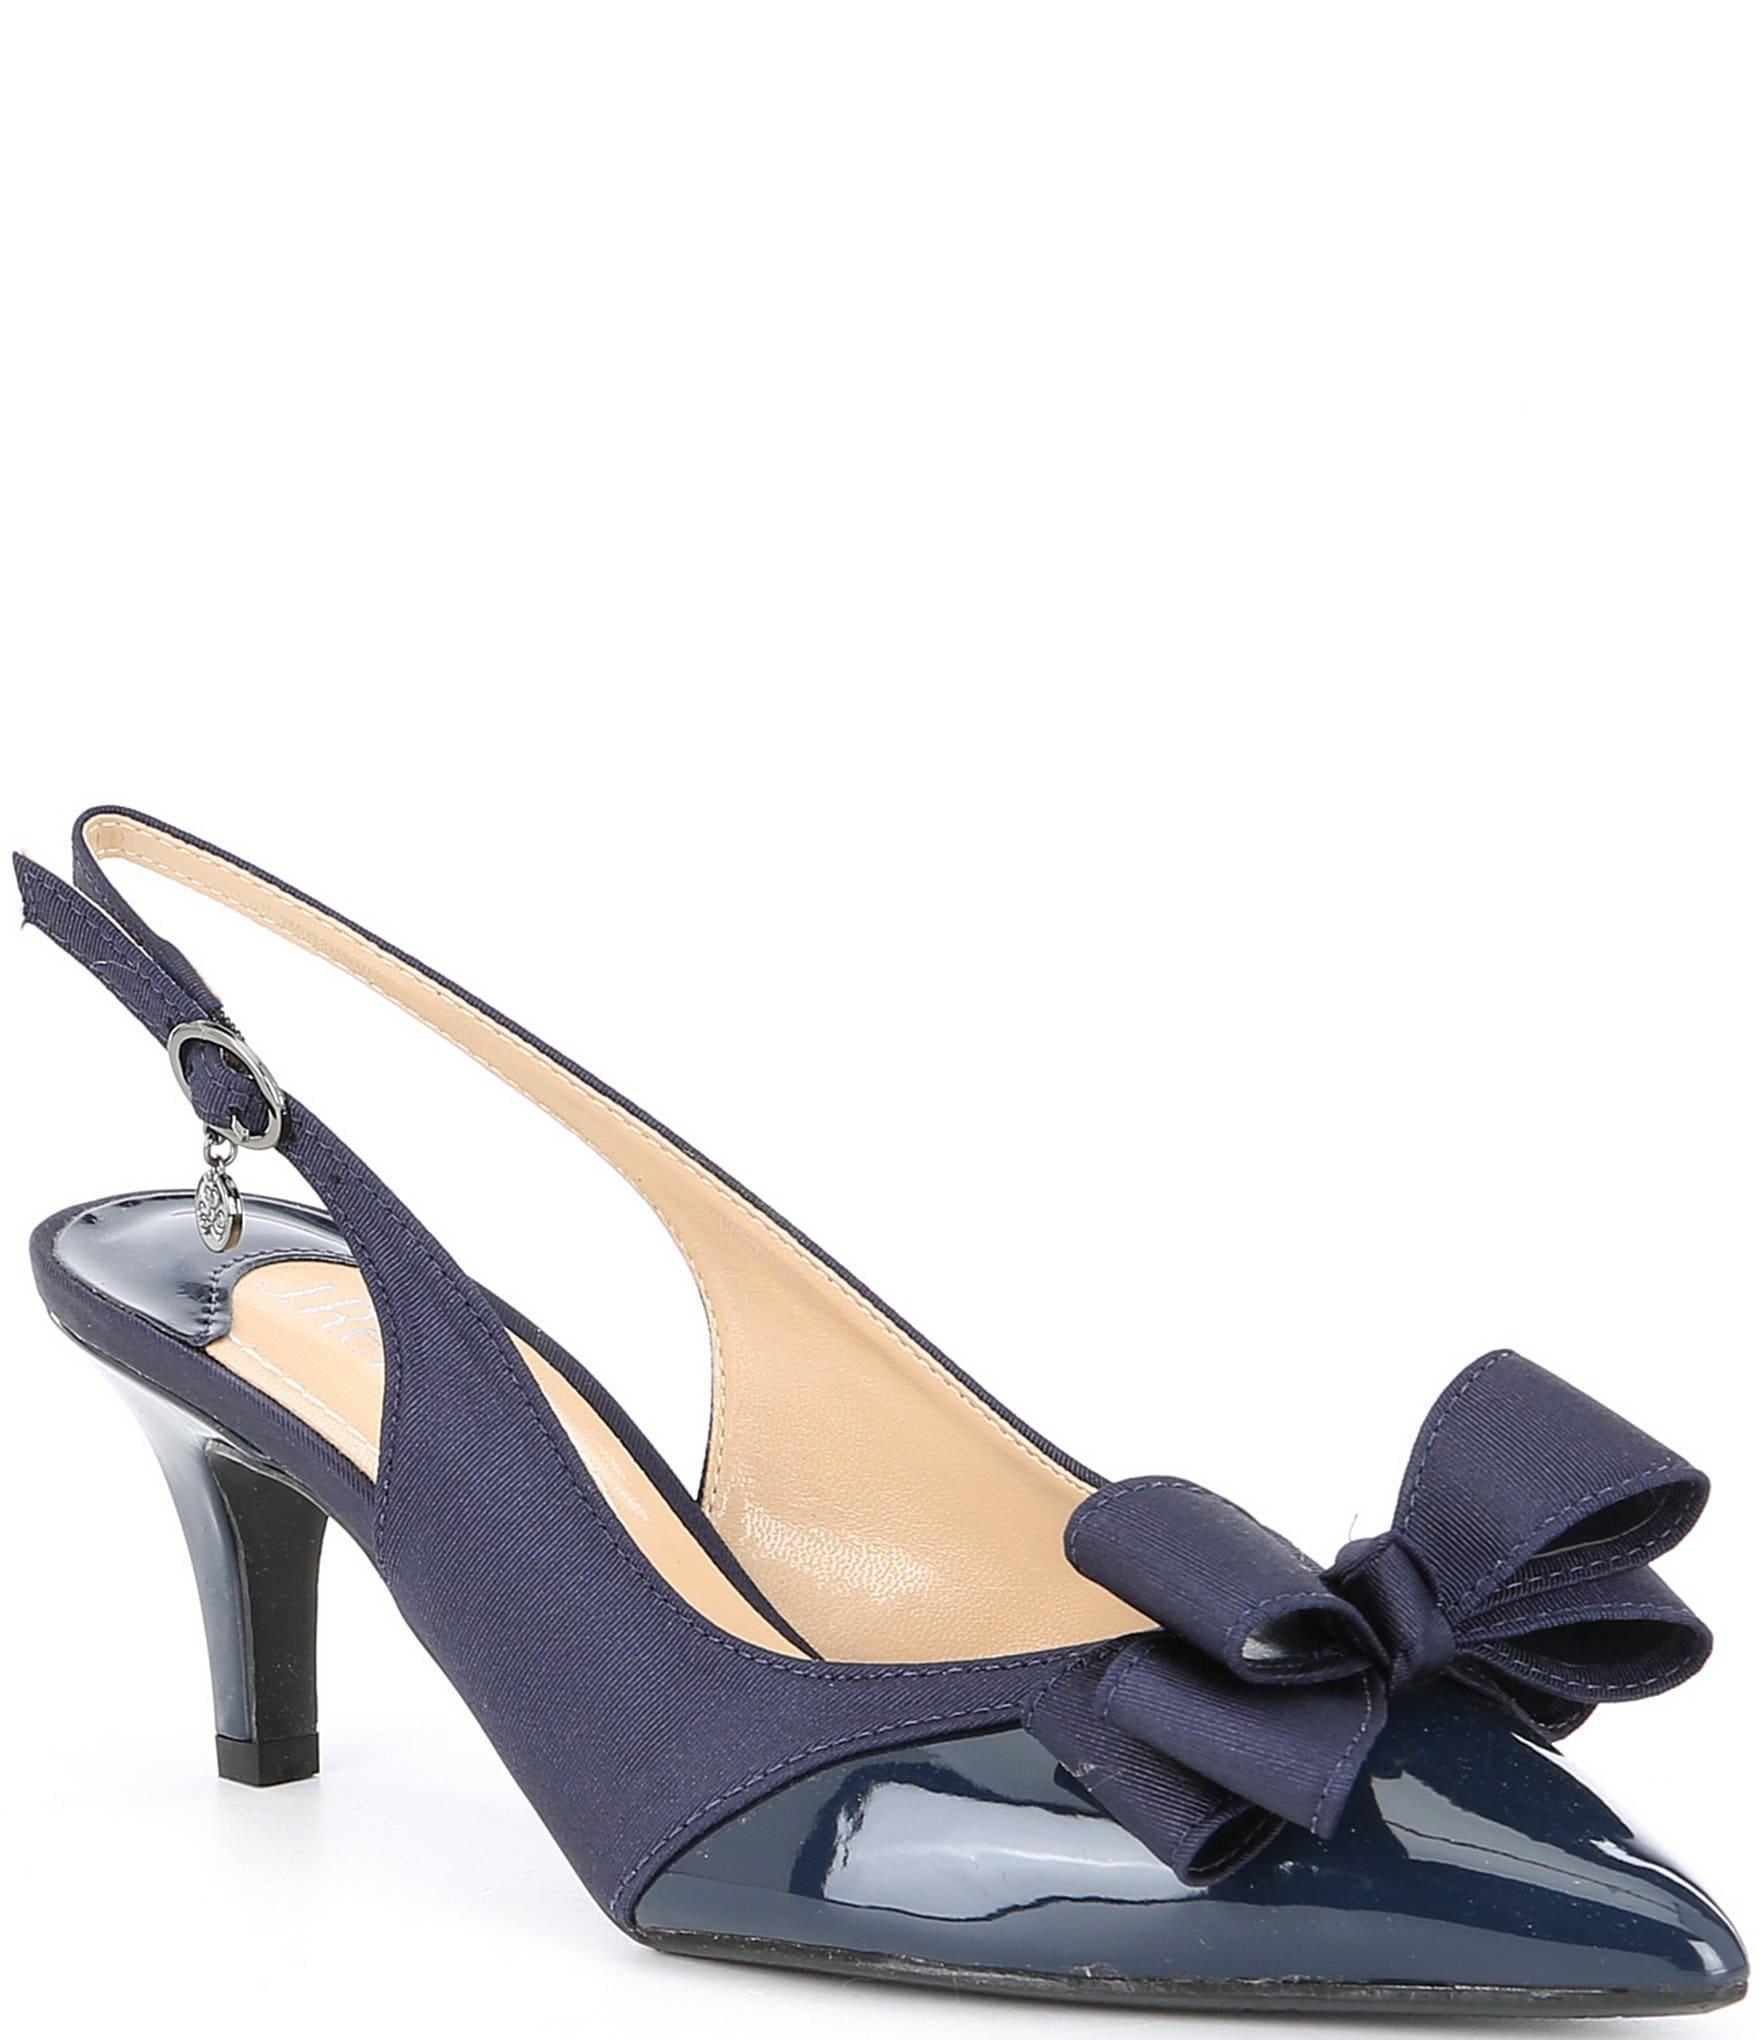 navy blue dressy: Shoes | Dillard's